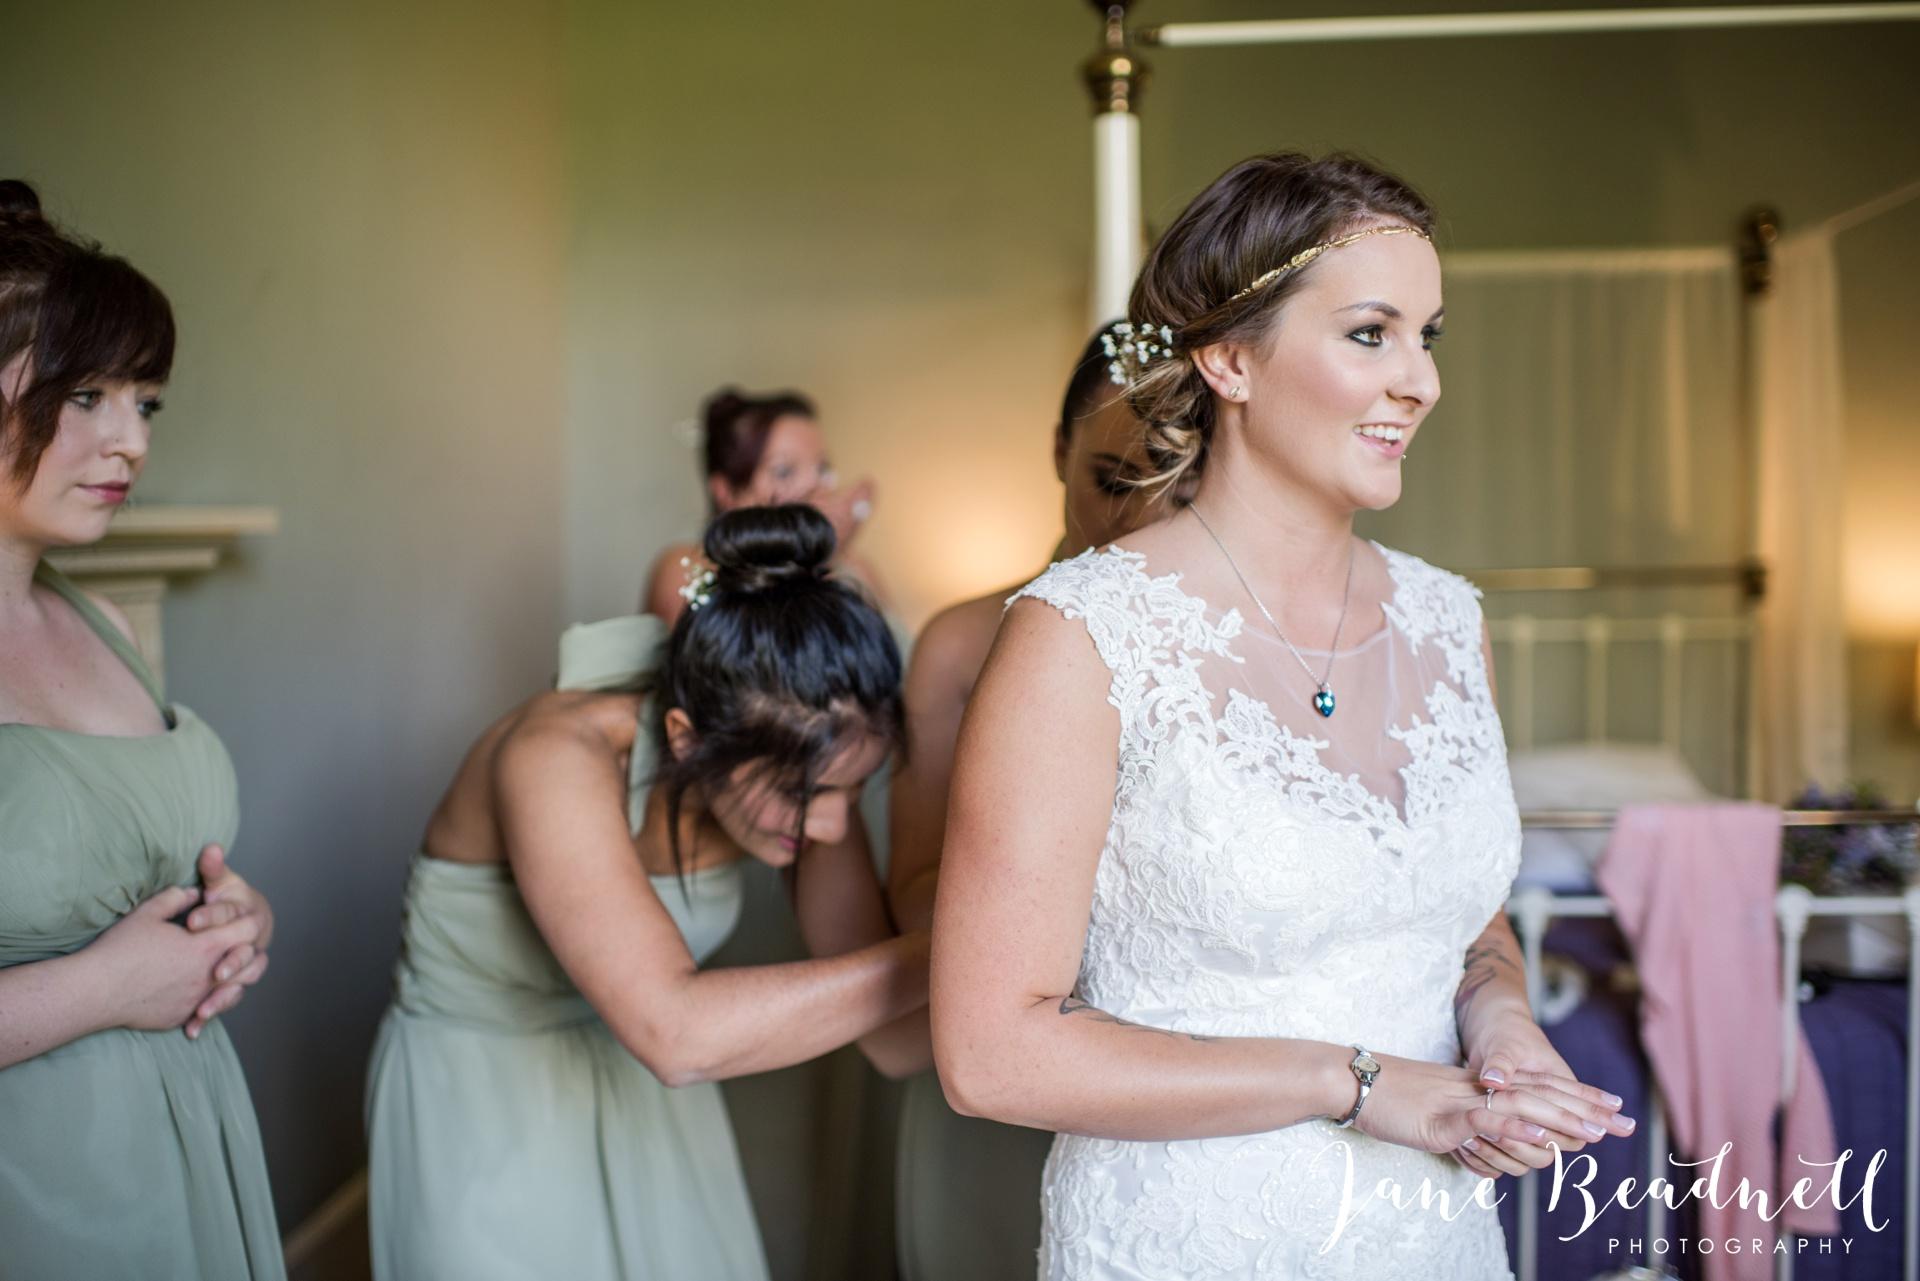 Jane Beadnell fine art wedding photographer The Old Deanery Ripon_0017